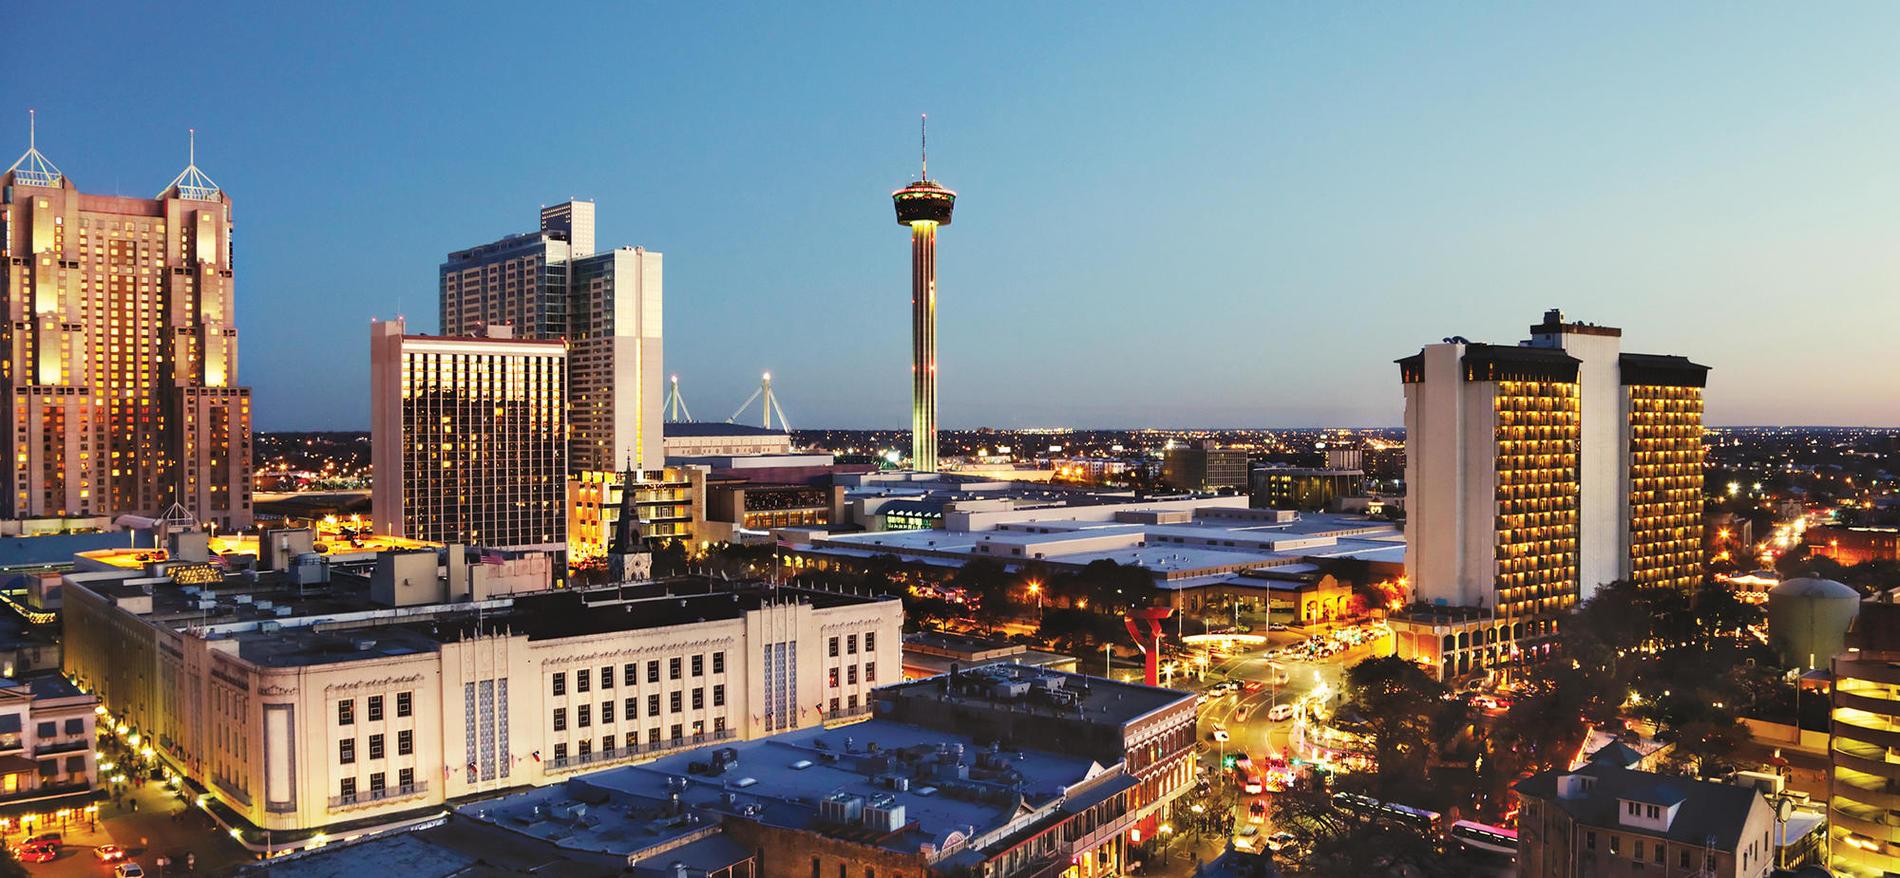 foto de THE DINGA/HOLLINGSWORTH GROUP   Amarillo, TX   Morgan Stanley ...